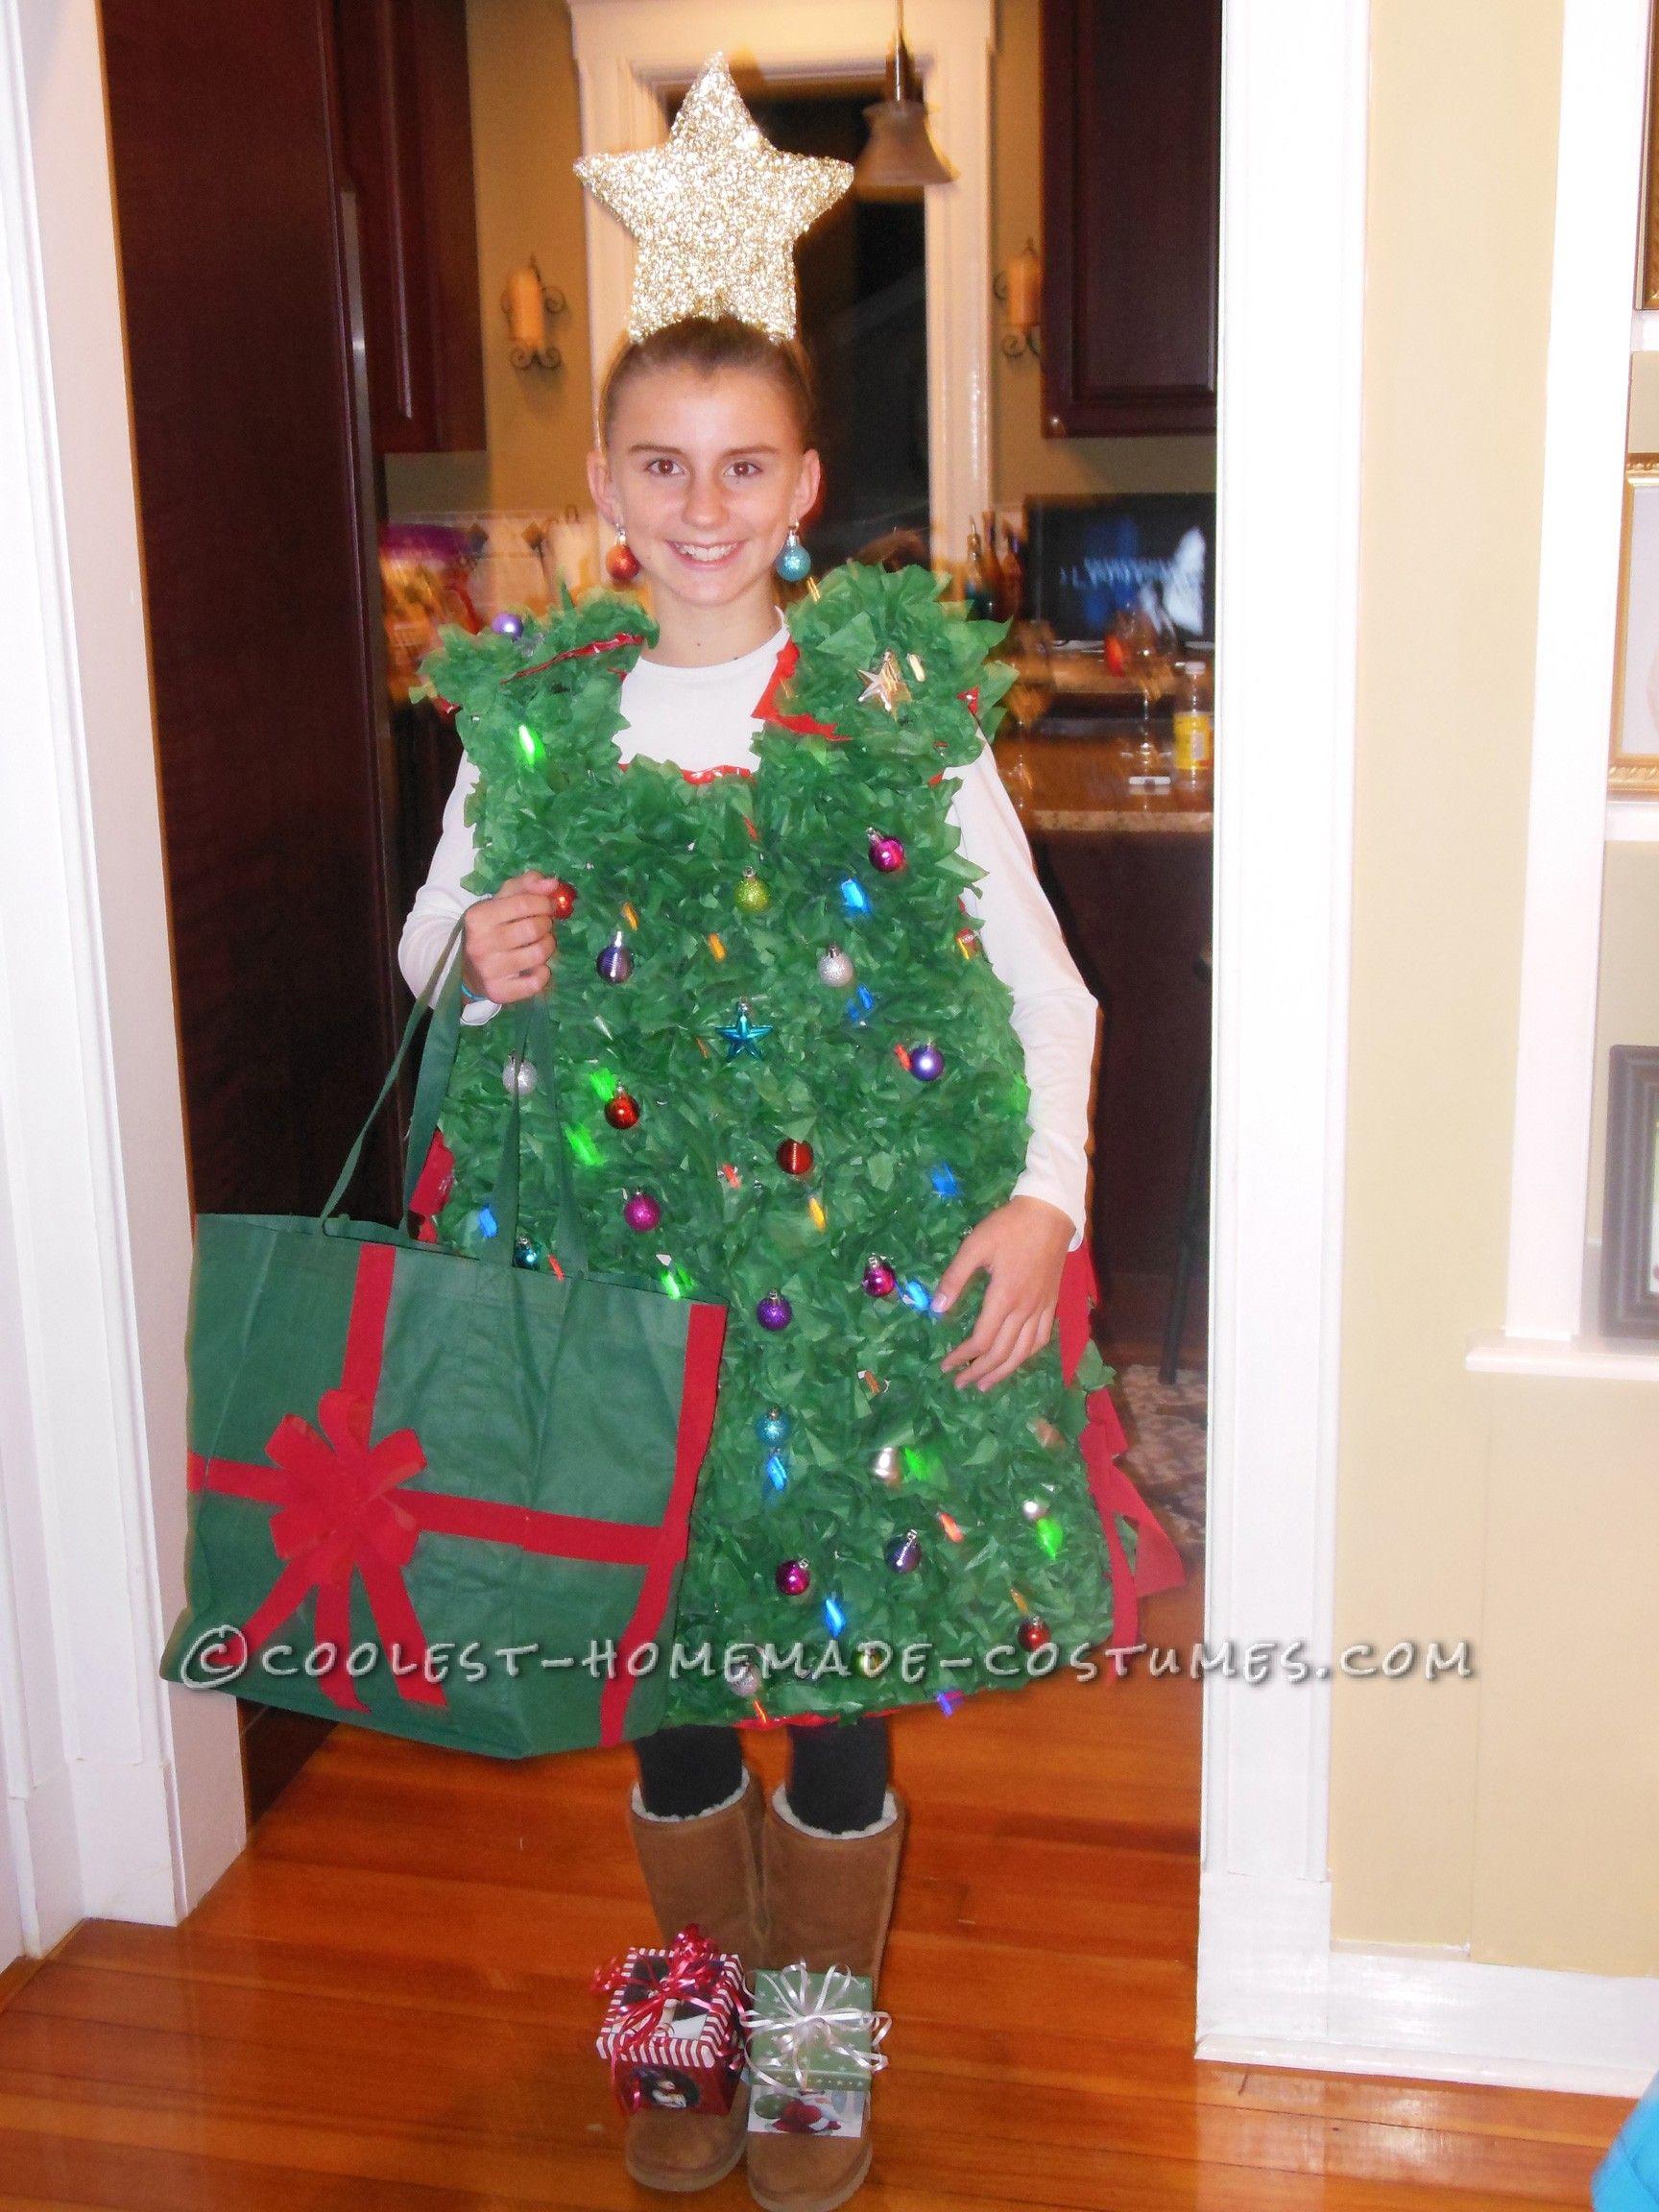 Cool Twinkling Christmas Tree Costume Tree Costume Christmas Tree Costume Christmas Tree Halloween Costume